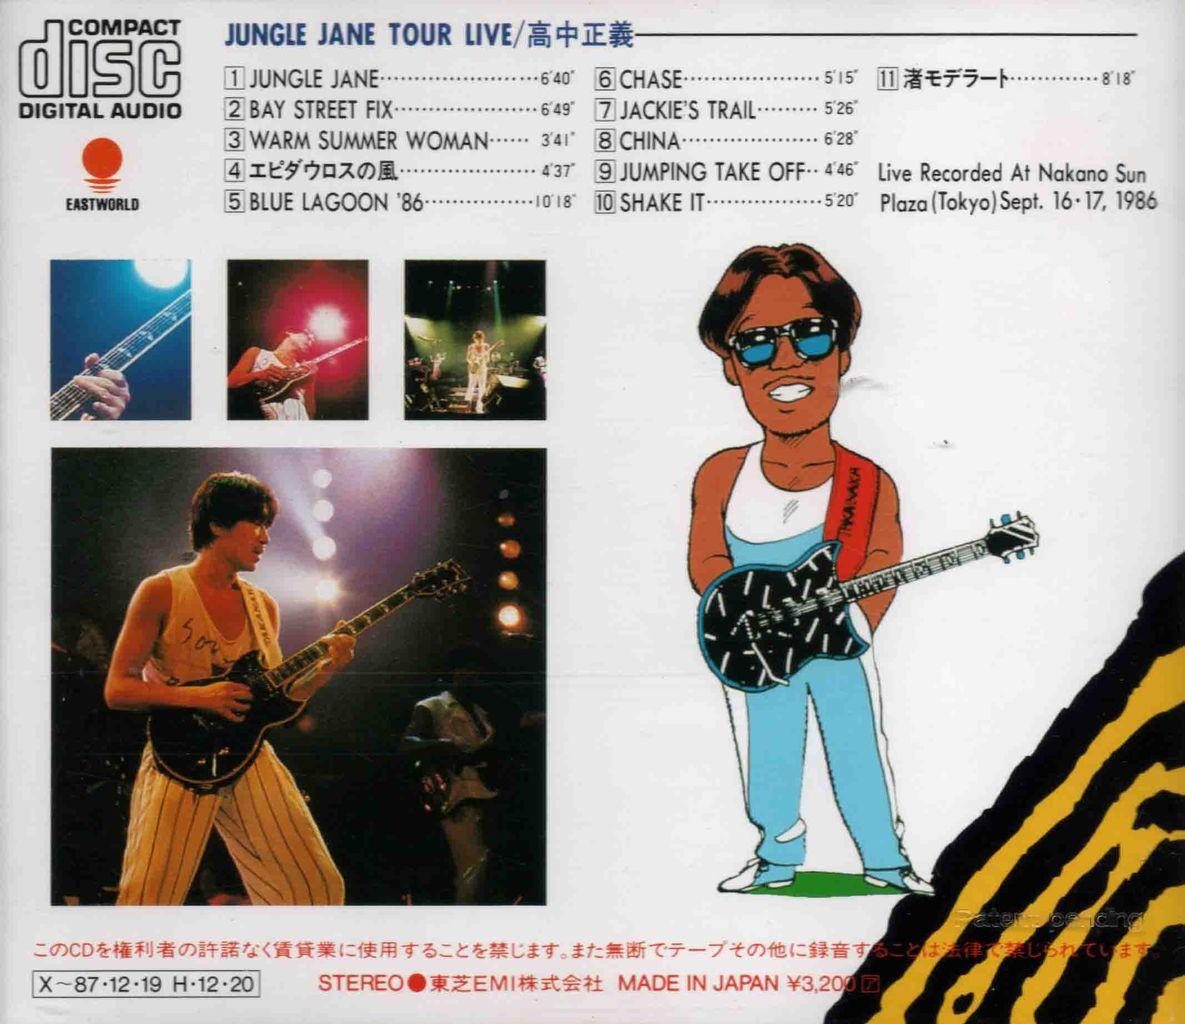 JUNGLE JANE TOUR LIVE-2